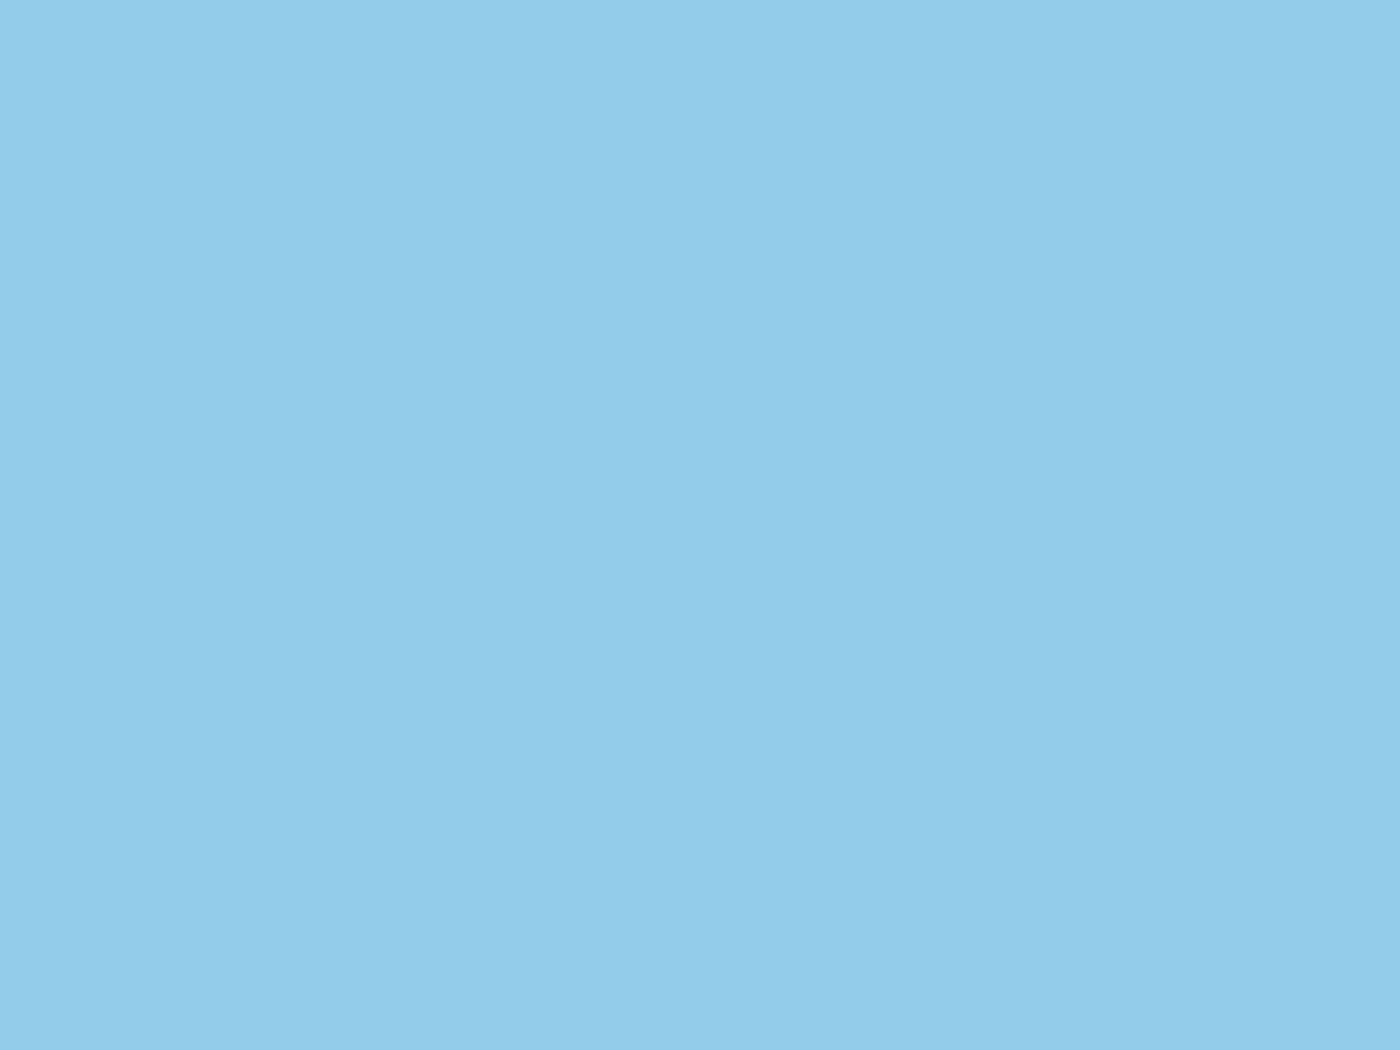 1400x1050 Light Cornflower Blue Solid Color Background